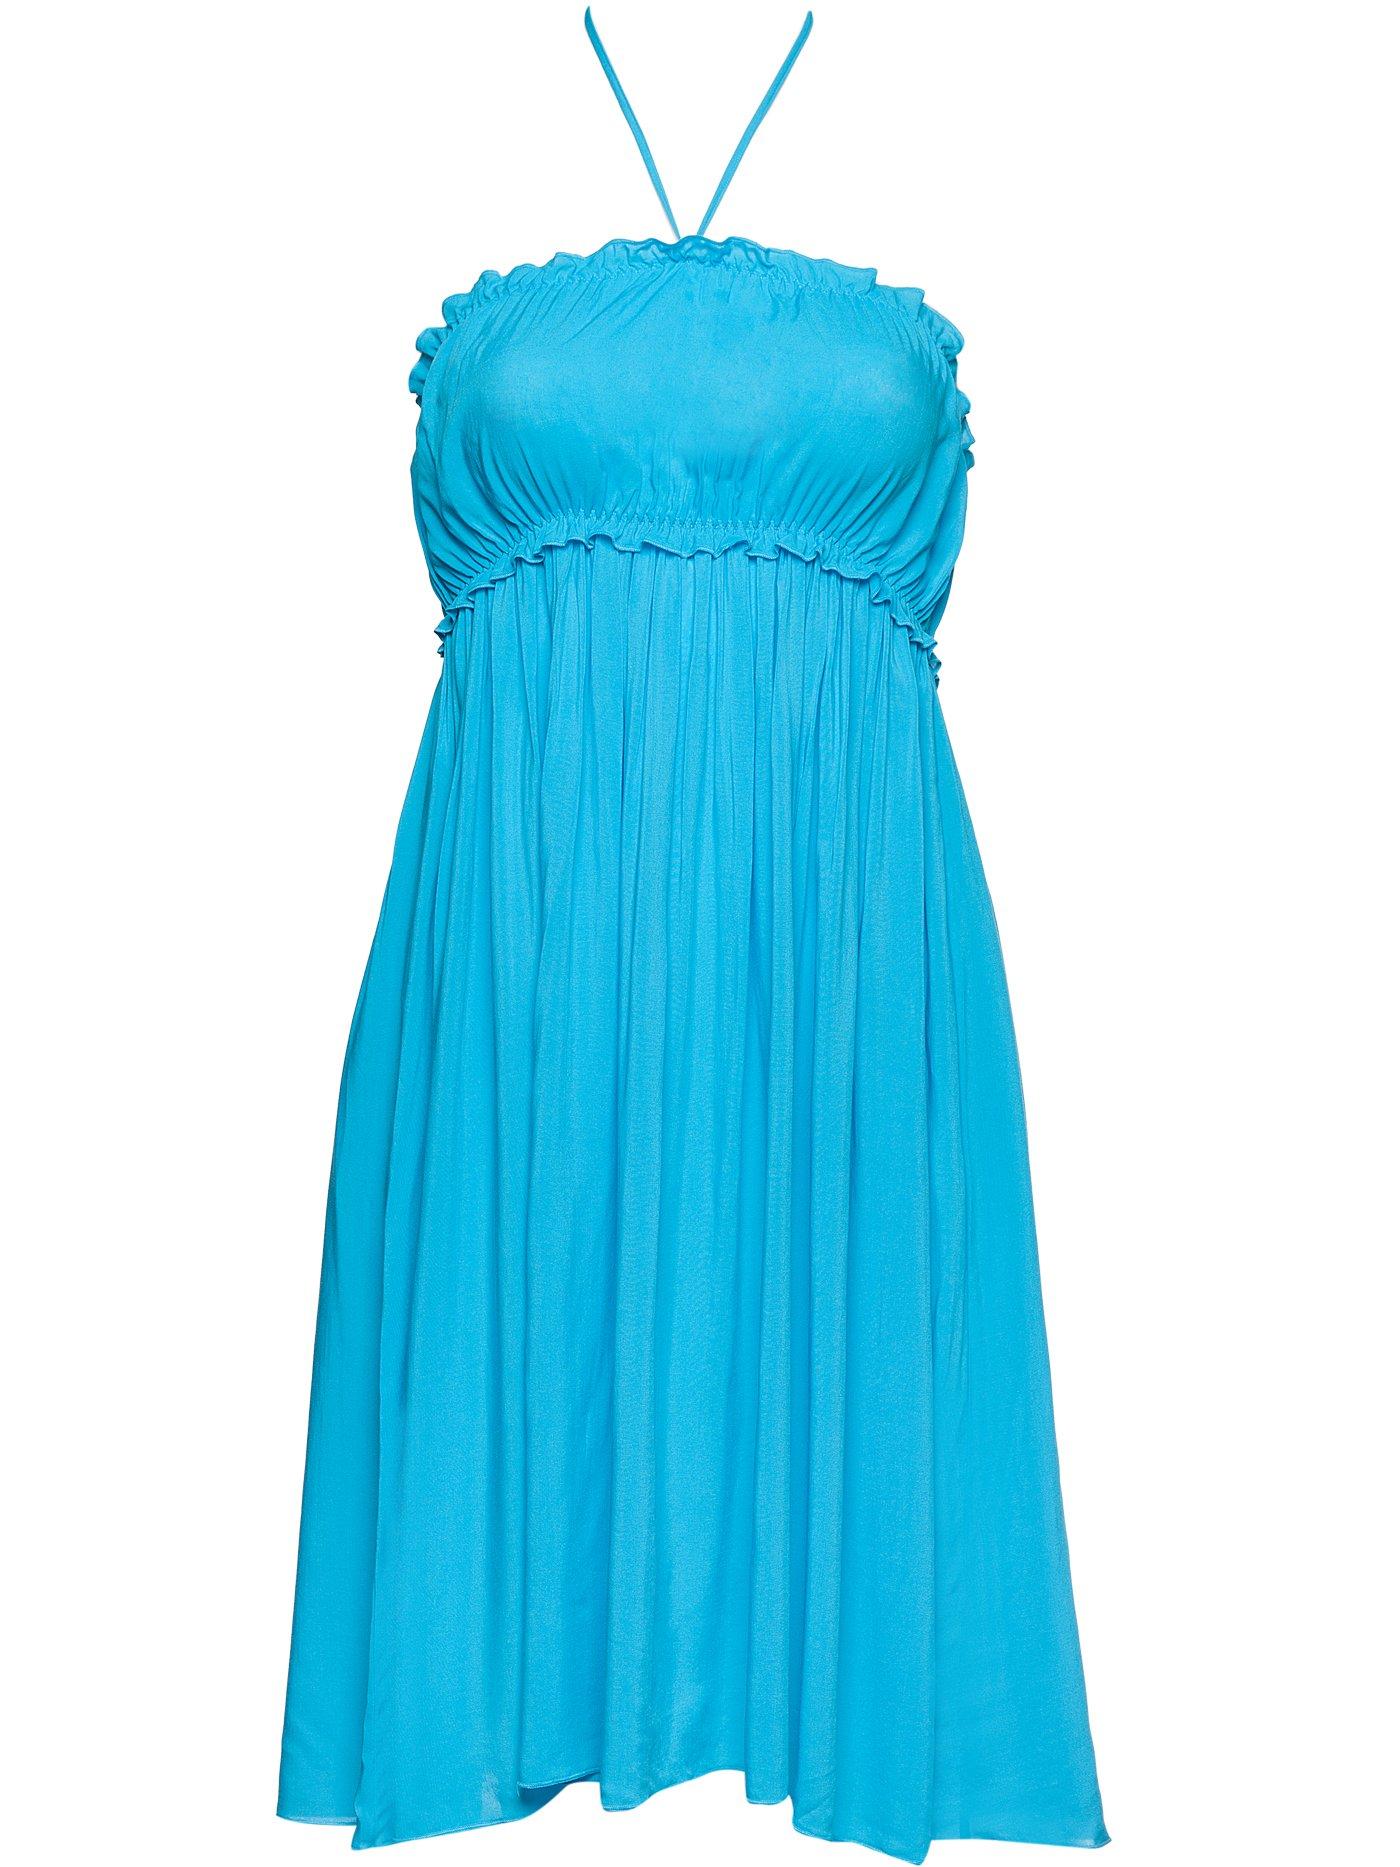 Платье vendetta bikini cocktailБюстье<br>платье<br><br>Цвет: Голубой<br>Декор: Без декора<br>Стилистика: Без стилистики<br>Направление: Бюстье<br>Пол: Женский<br>Материал: 100%ВИ<br>Размер: 2